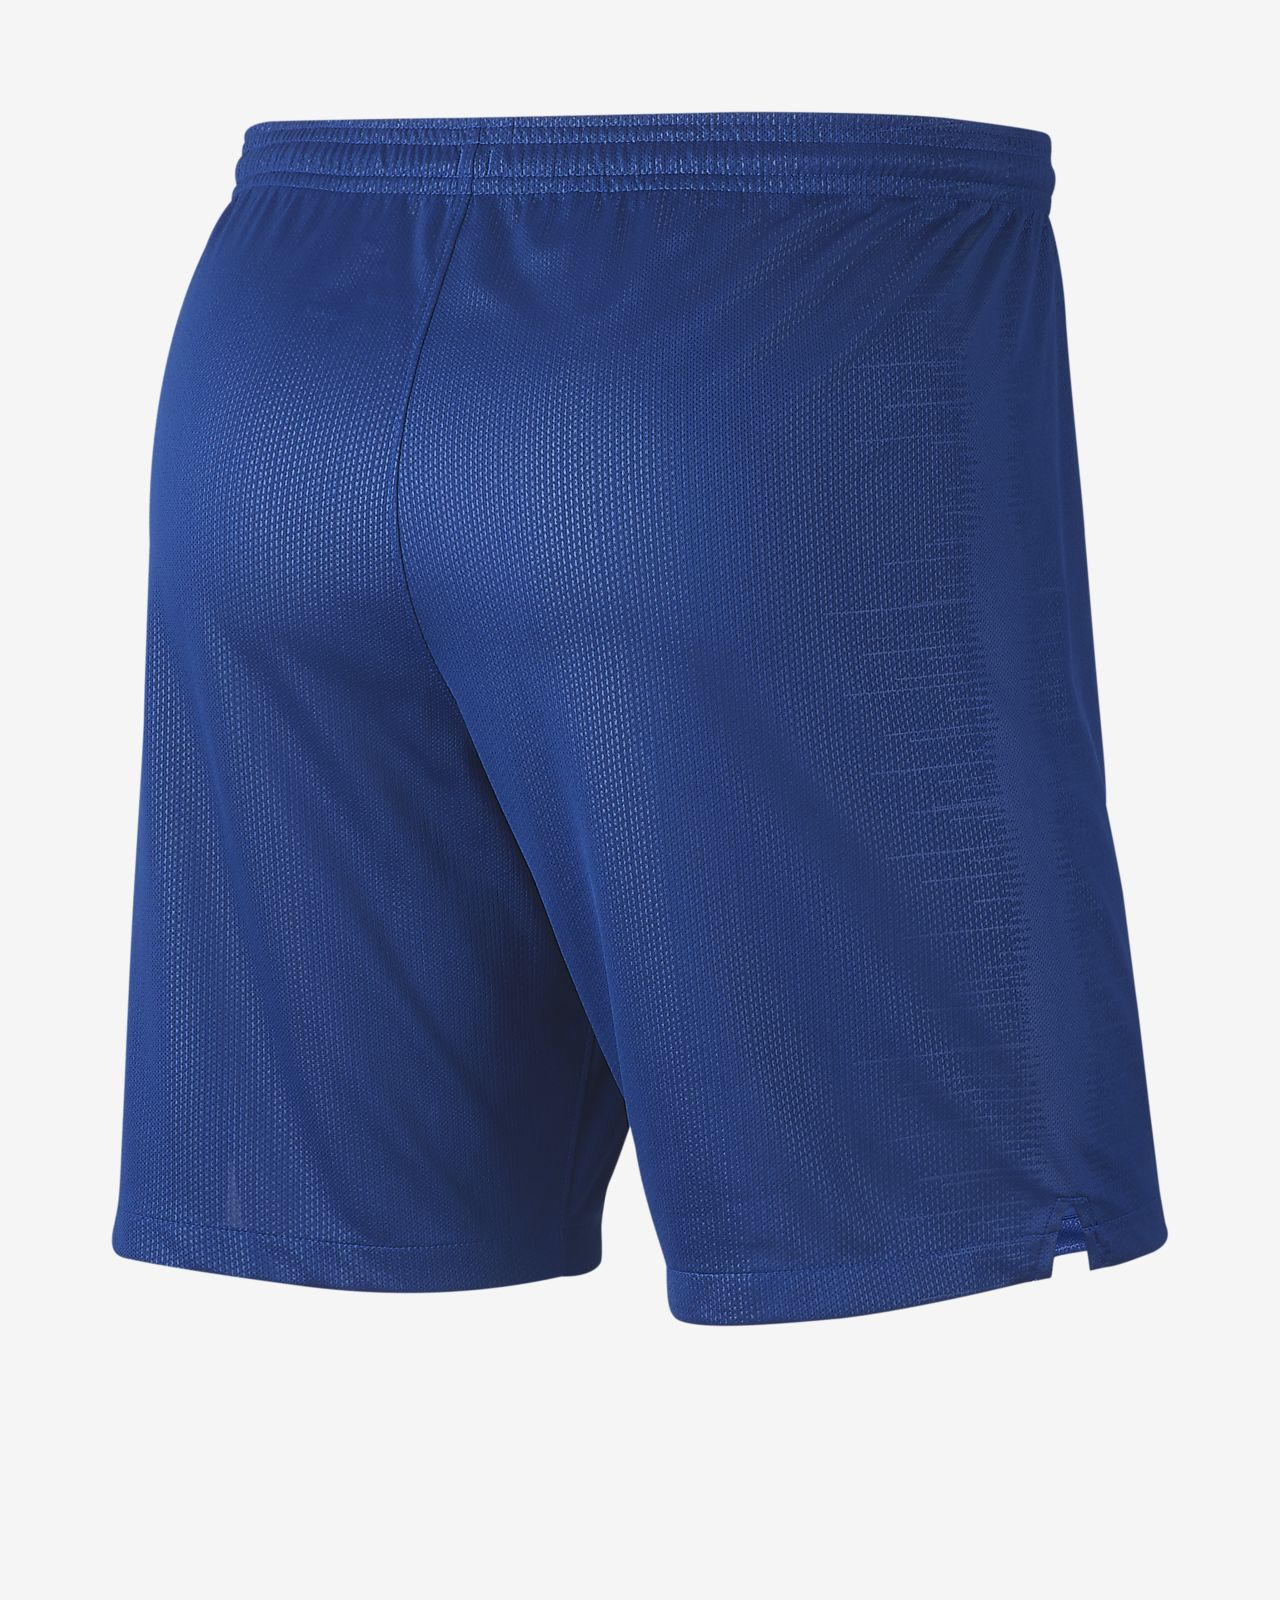 2e358d6ba1 2018 19 Chelsea FC Stadium Home Away Men s Football Shorts. Nike.com ZA